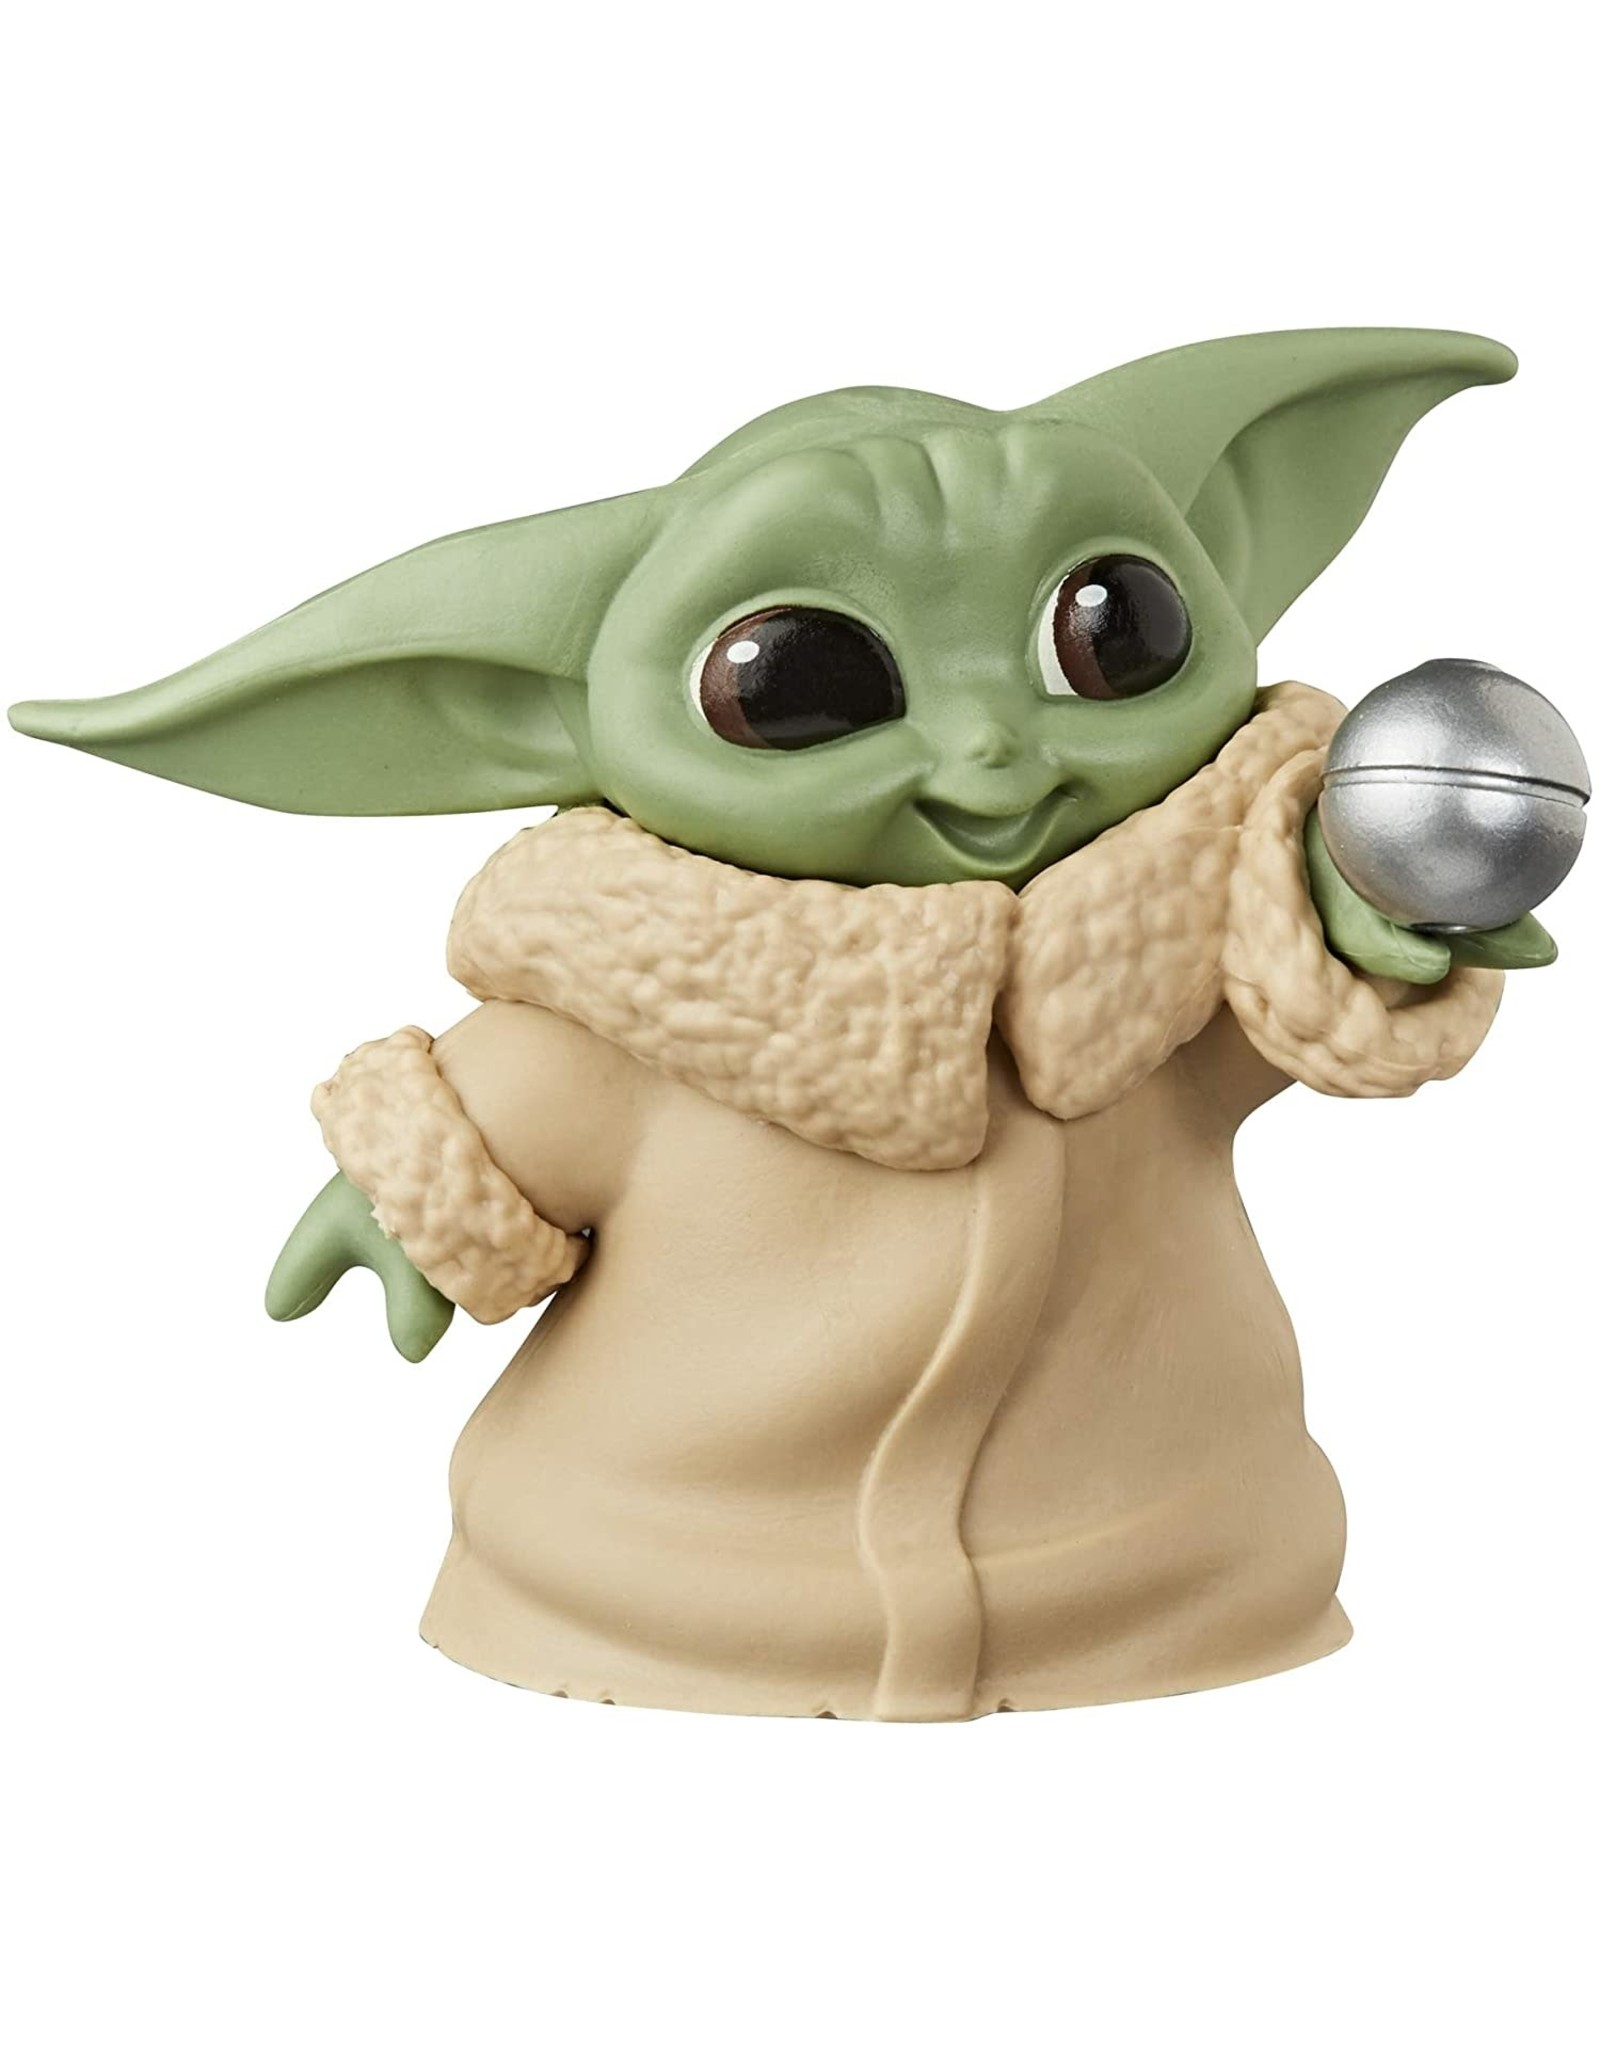 Hasbro Star Wars - Mandalorian the Child Bounty - Hold Ball